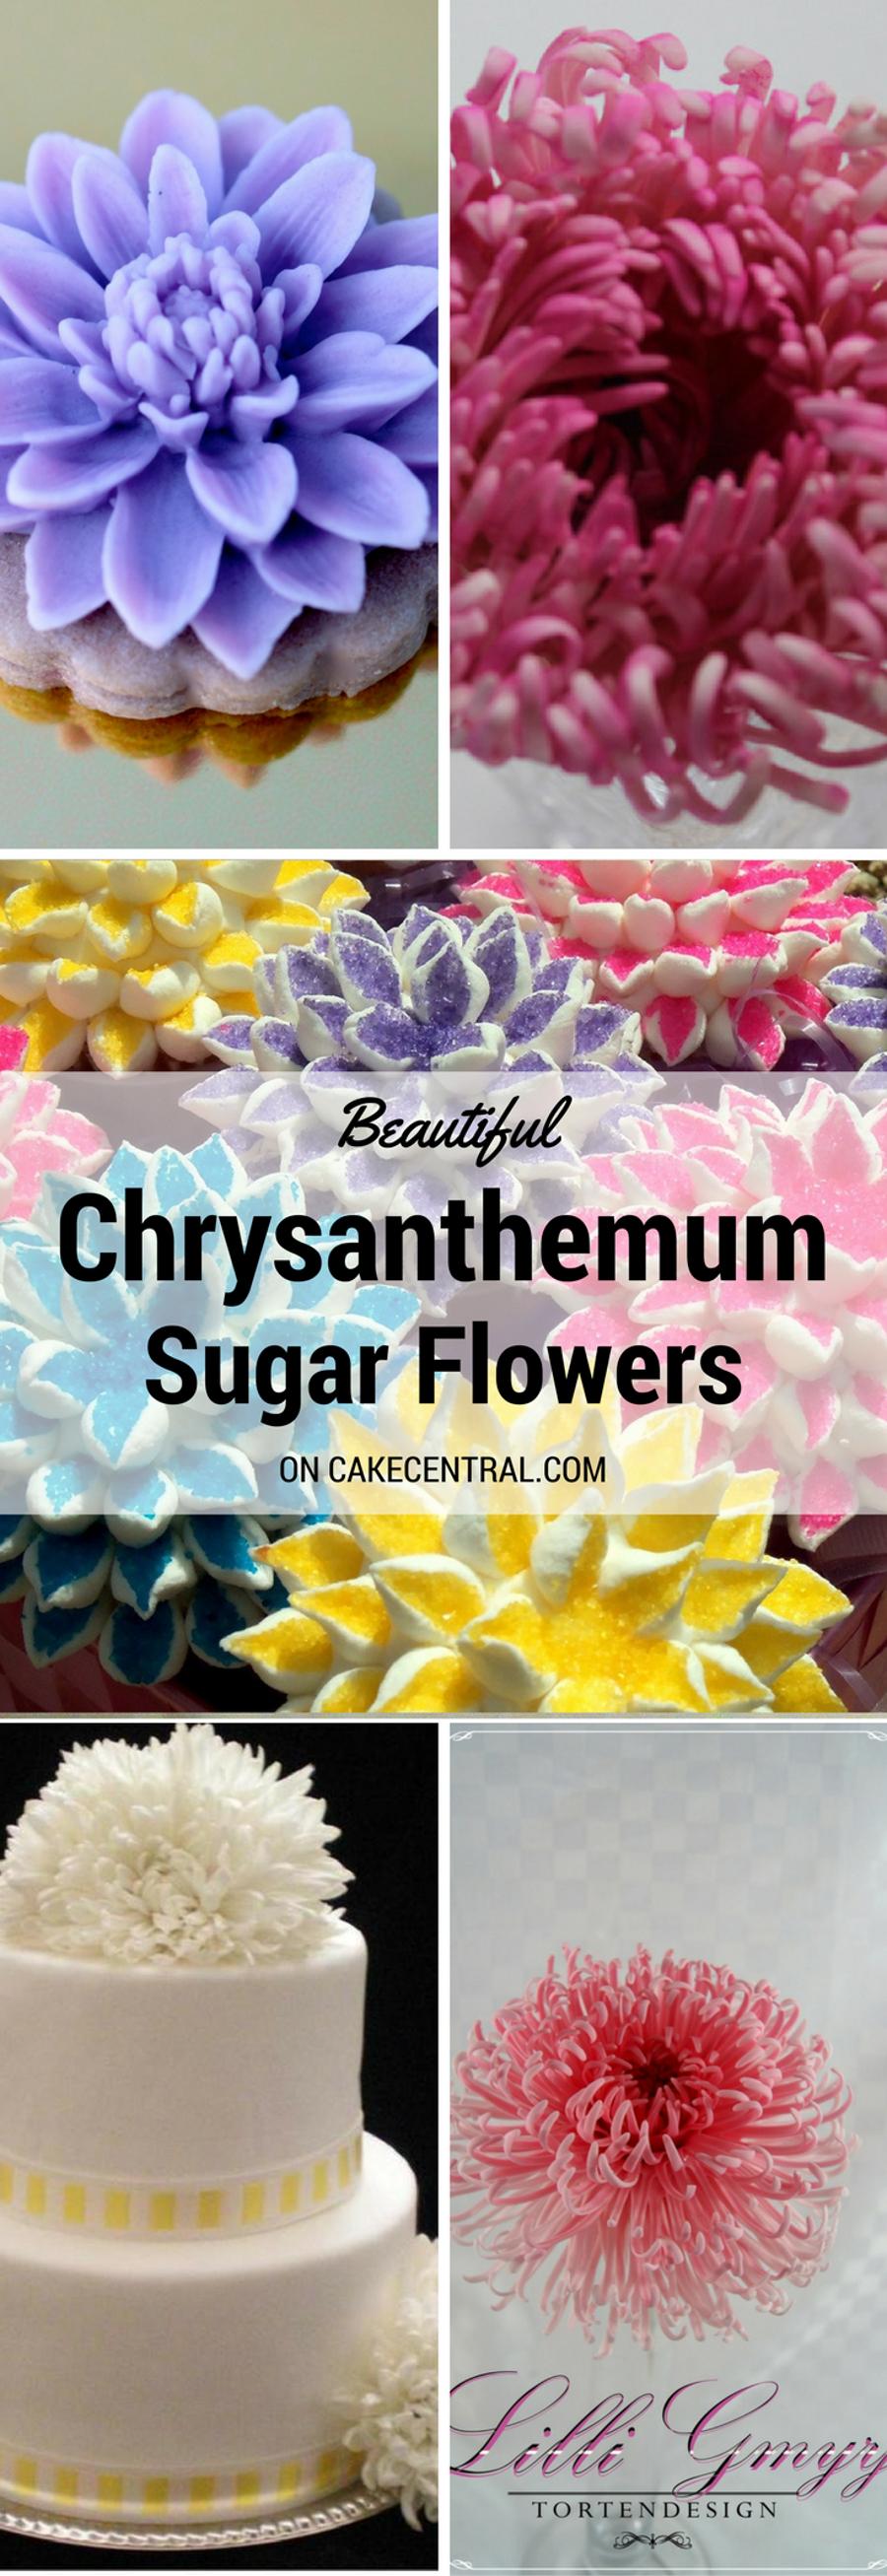 Beautiful Chrysanthemum Cakes Cakecentral Com